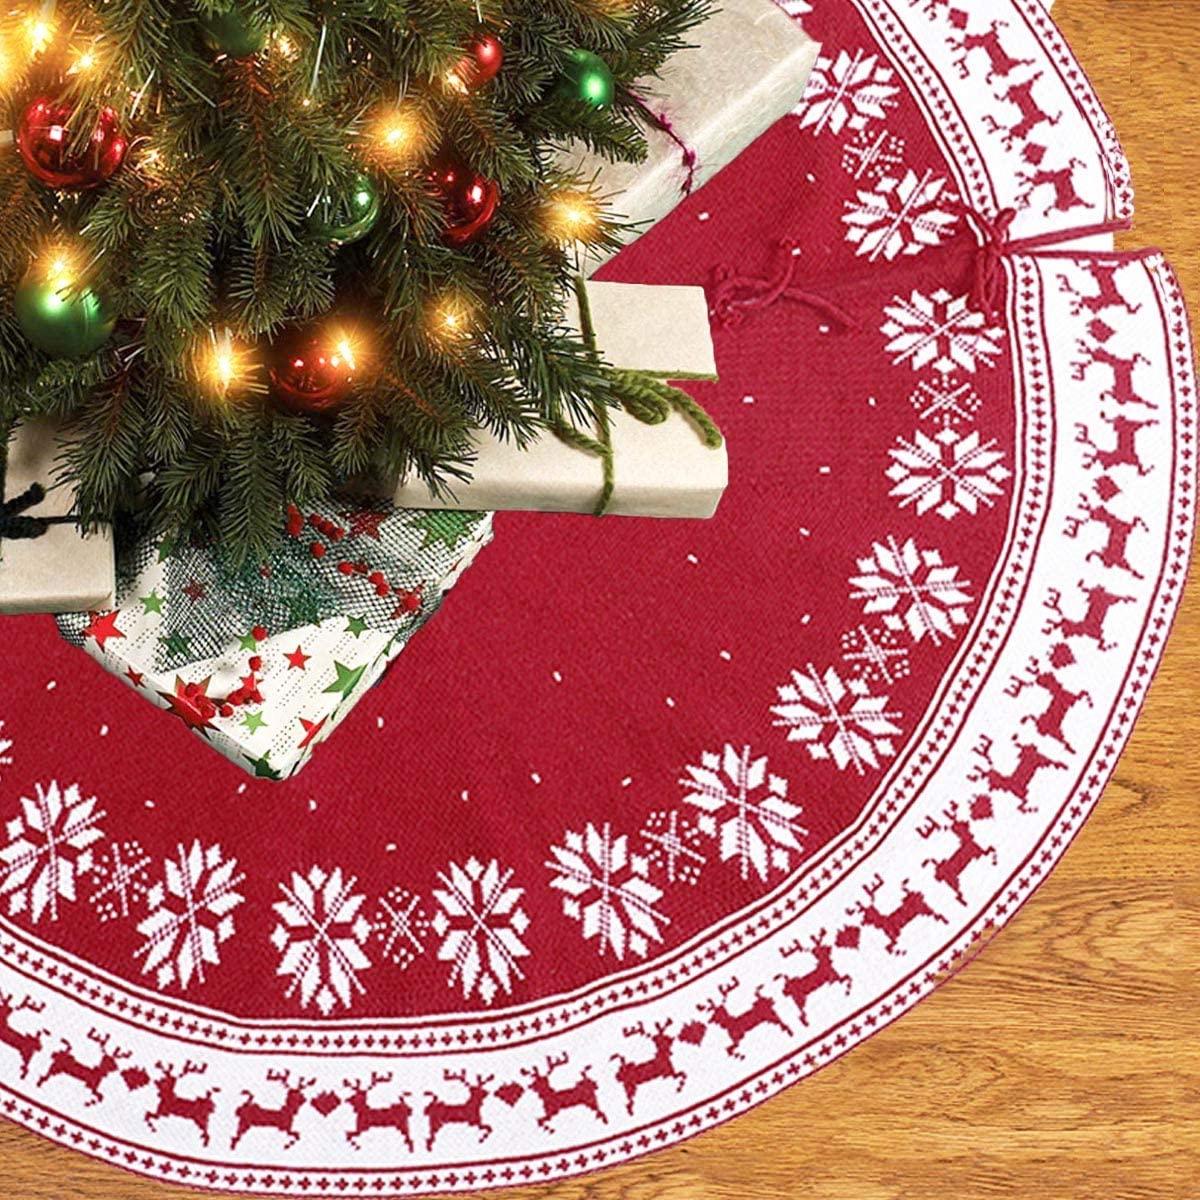 AMAZAC Christmas Tree Skirt in Red/White Snowflake Reindeer Design for Christmas Trees Christmas Decorations Indoor, 48